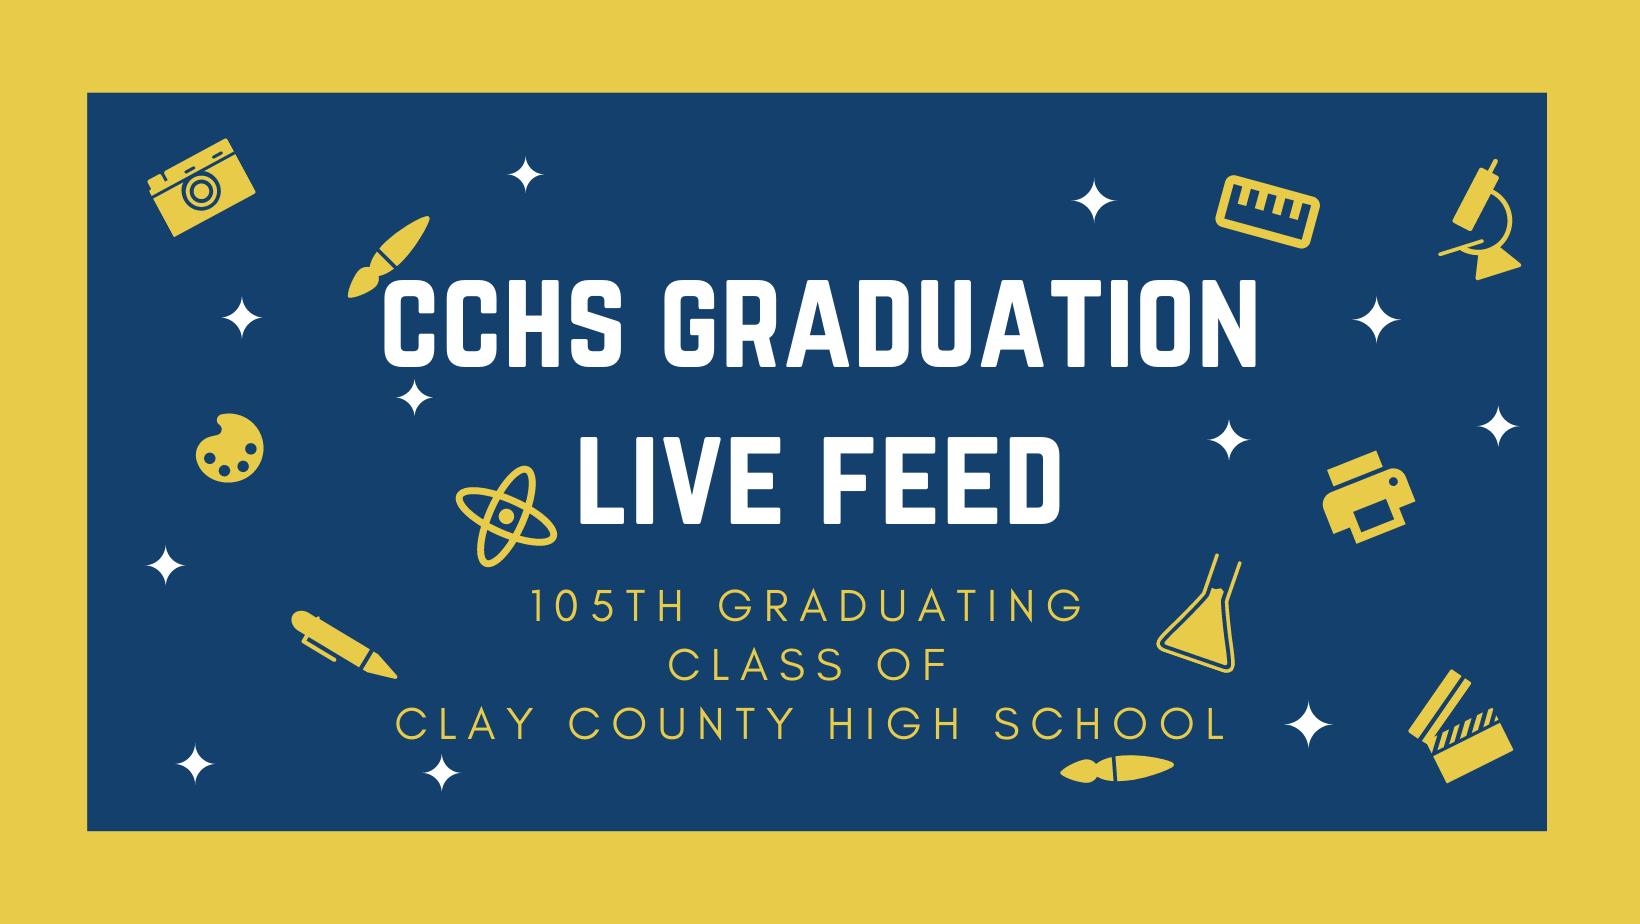 cchs graduation live feed